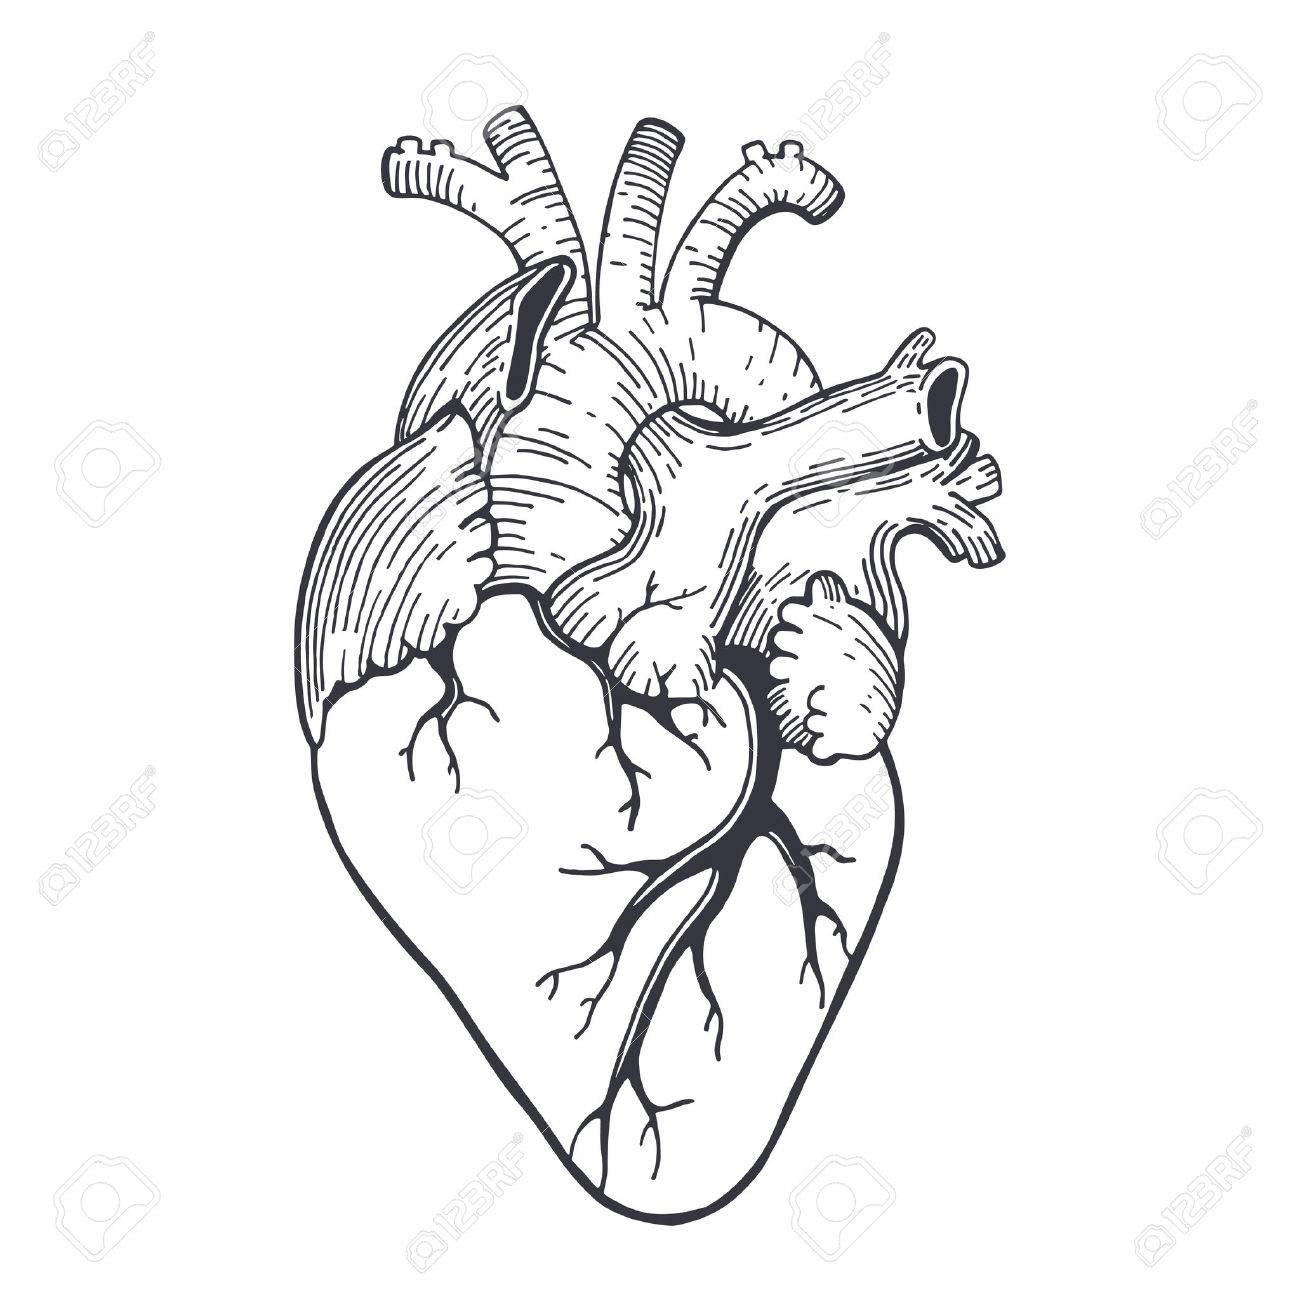 1300x1300 Vector Realistic Anatomical Heart Royalty Free Cliparts, Vectors